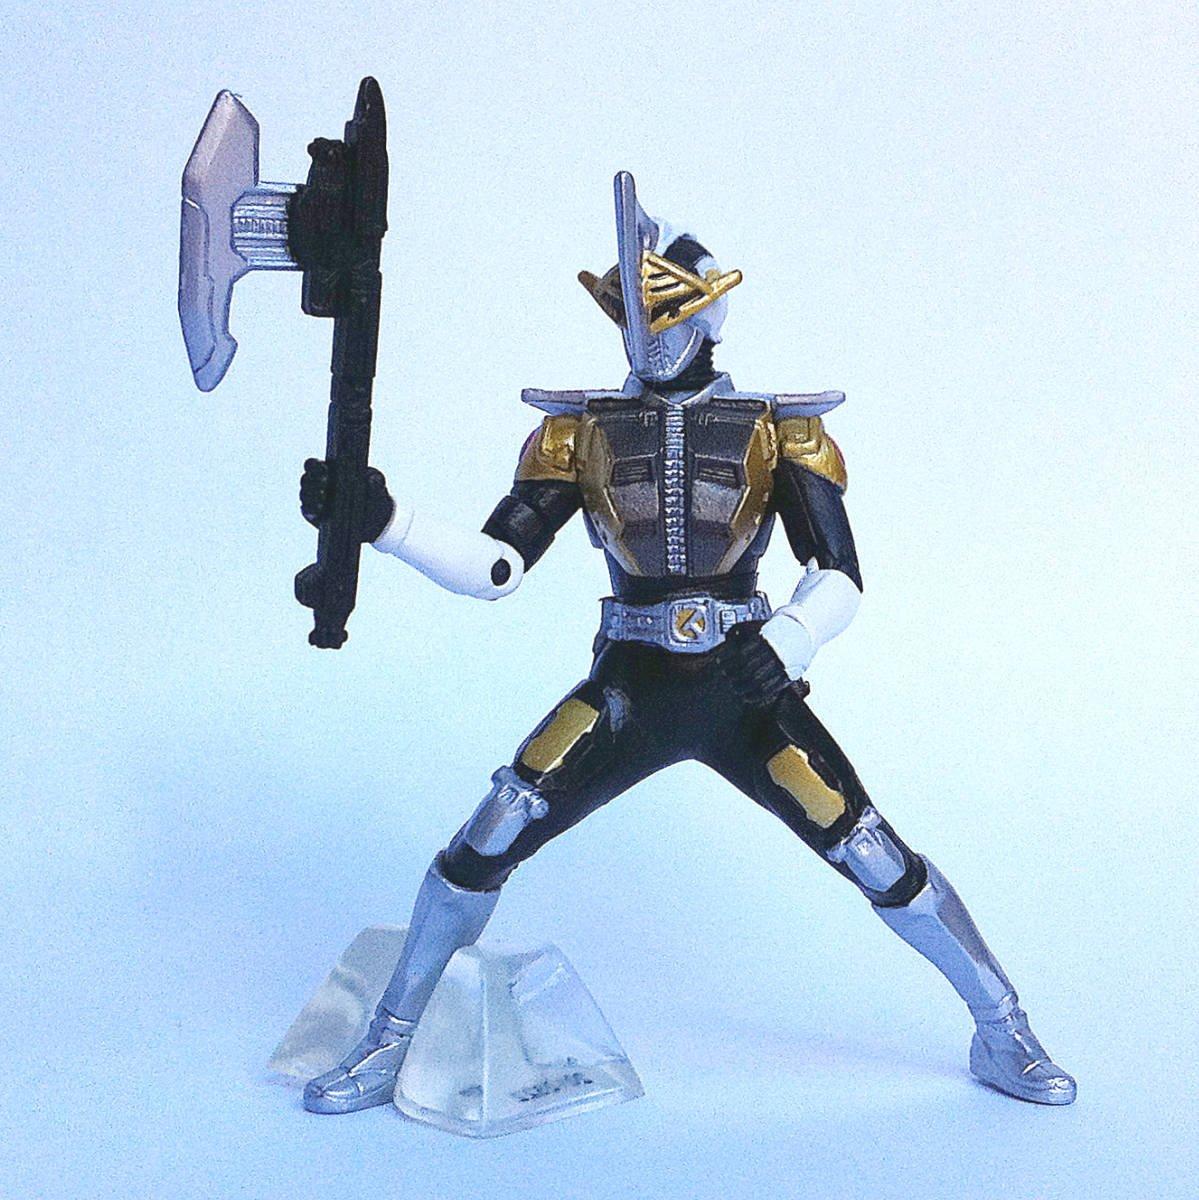 Kamen Rider Den-O Ax Form from Kamen Rider Action Pose by Bandai